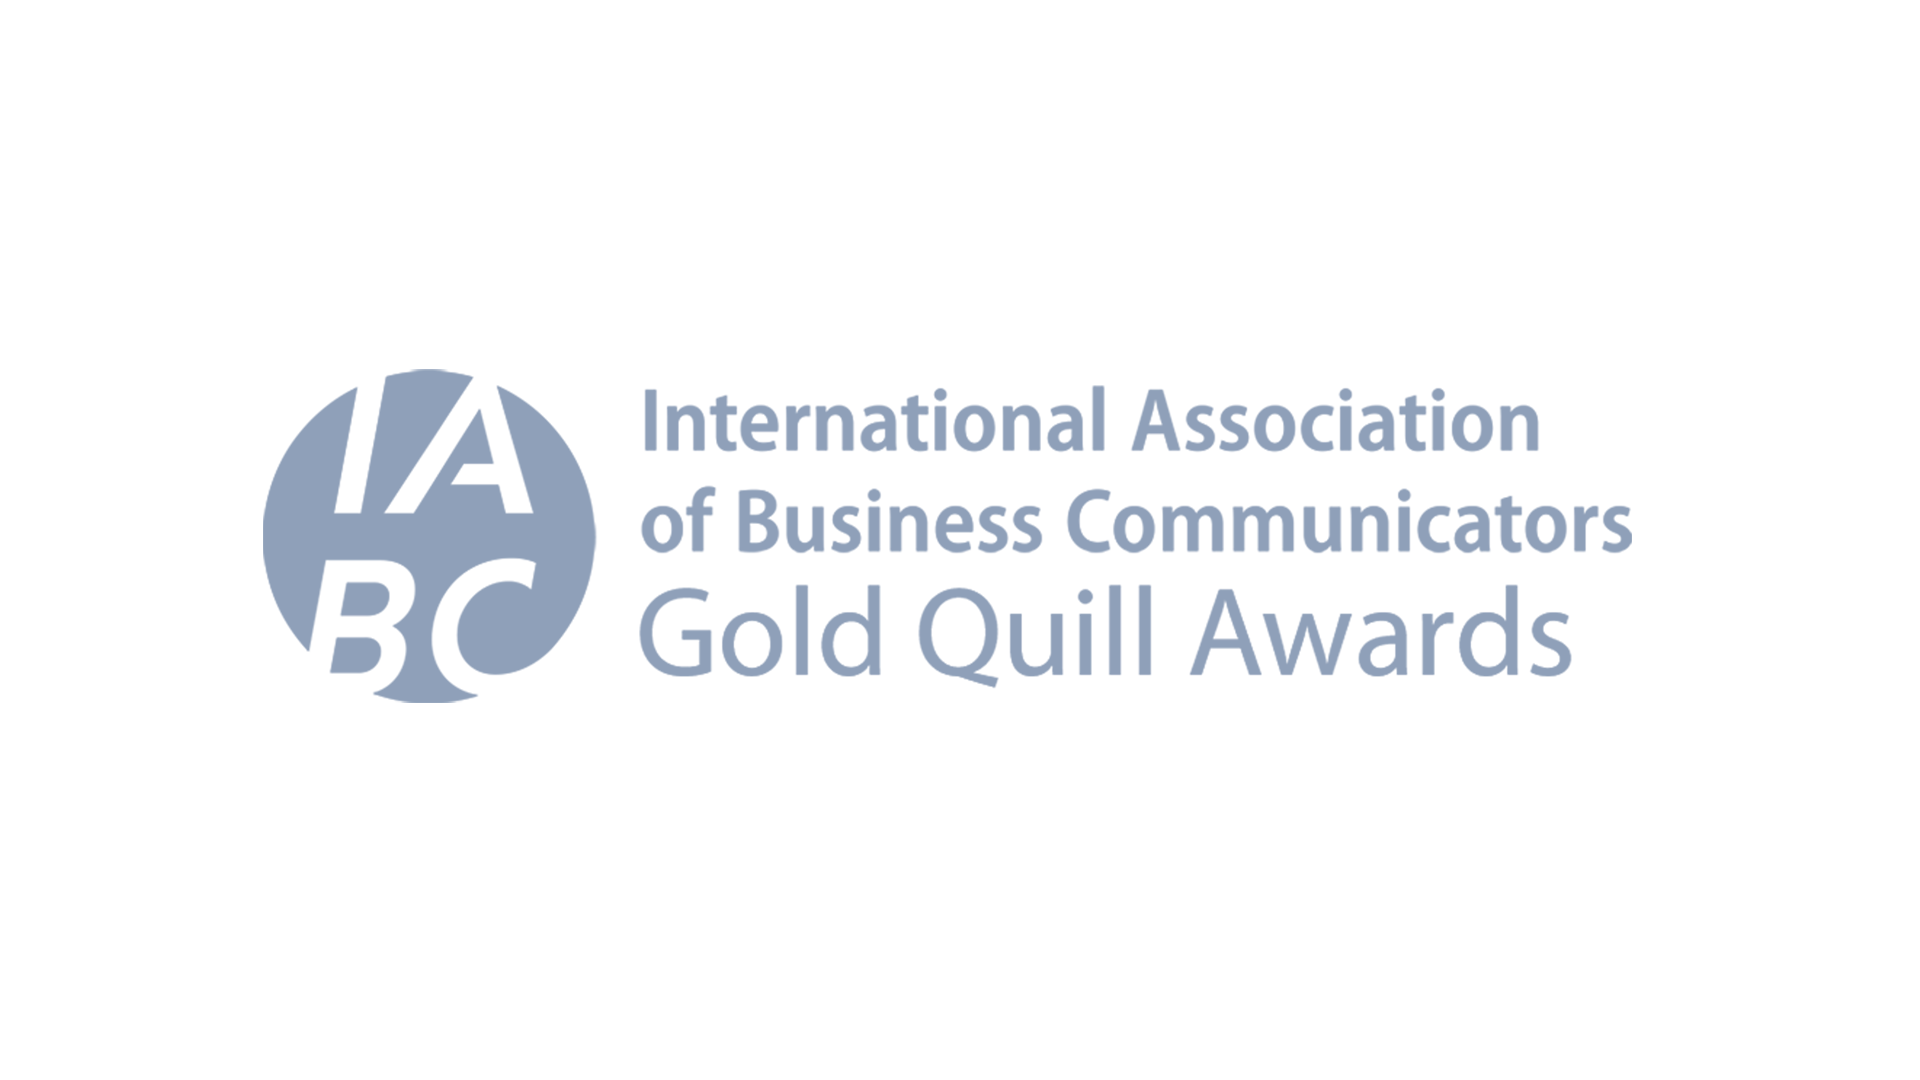 awards_logo_04